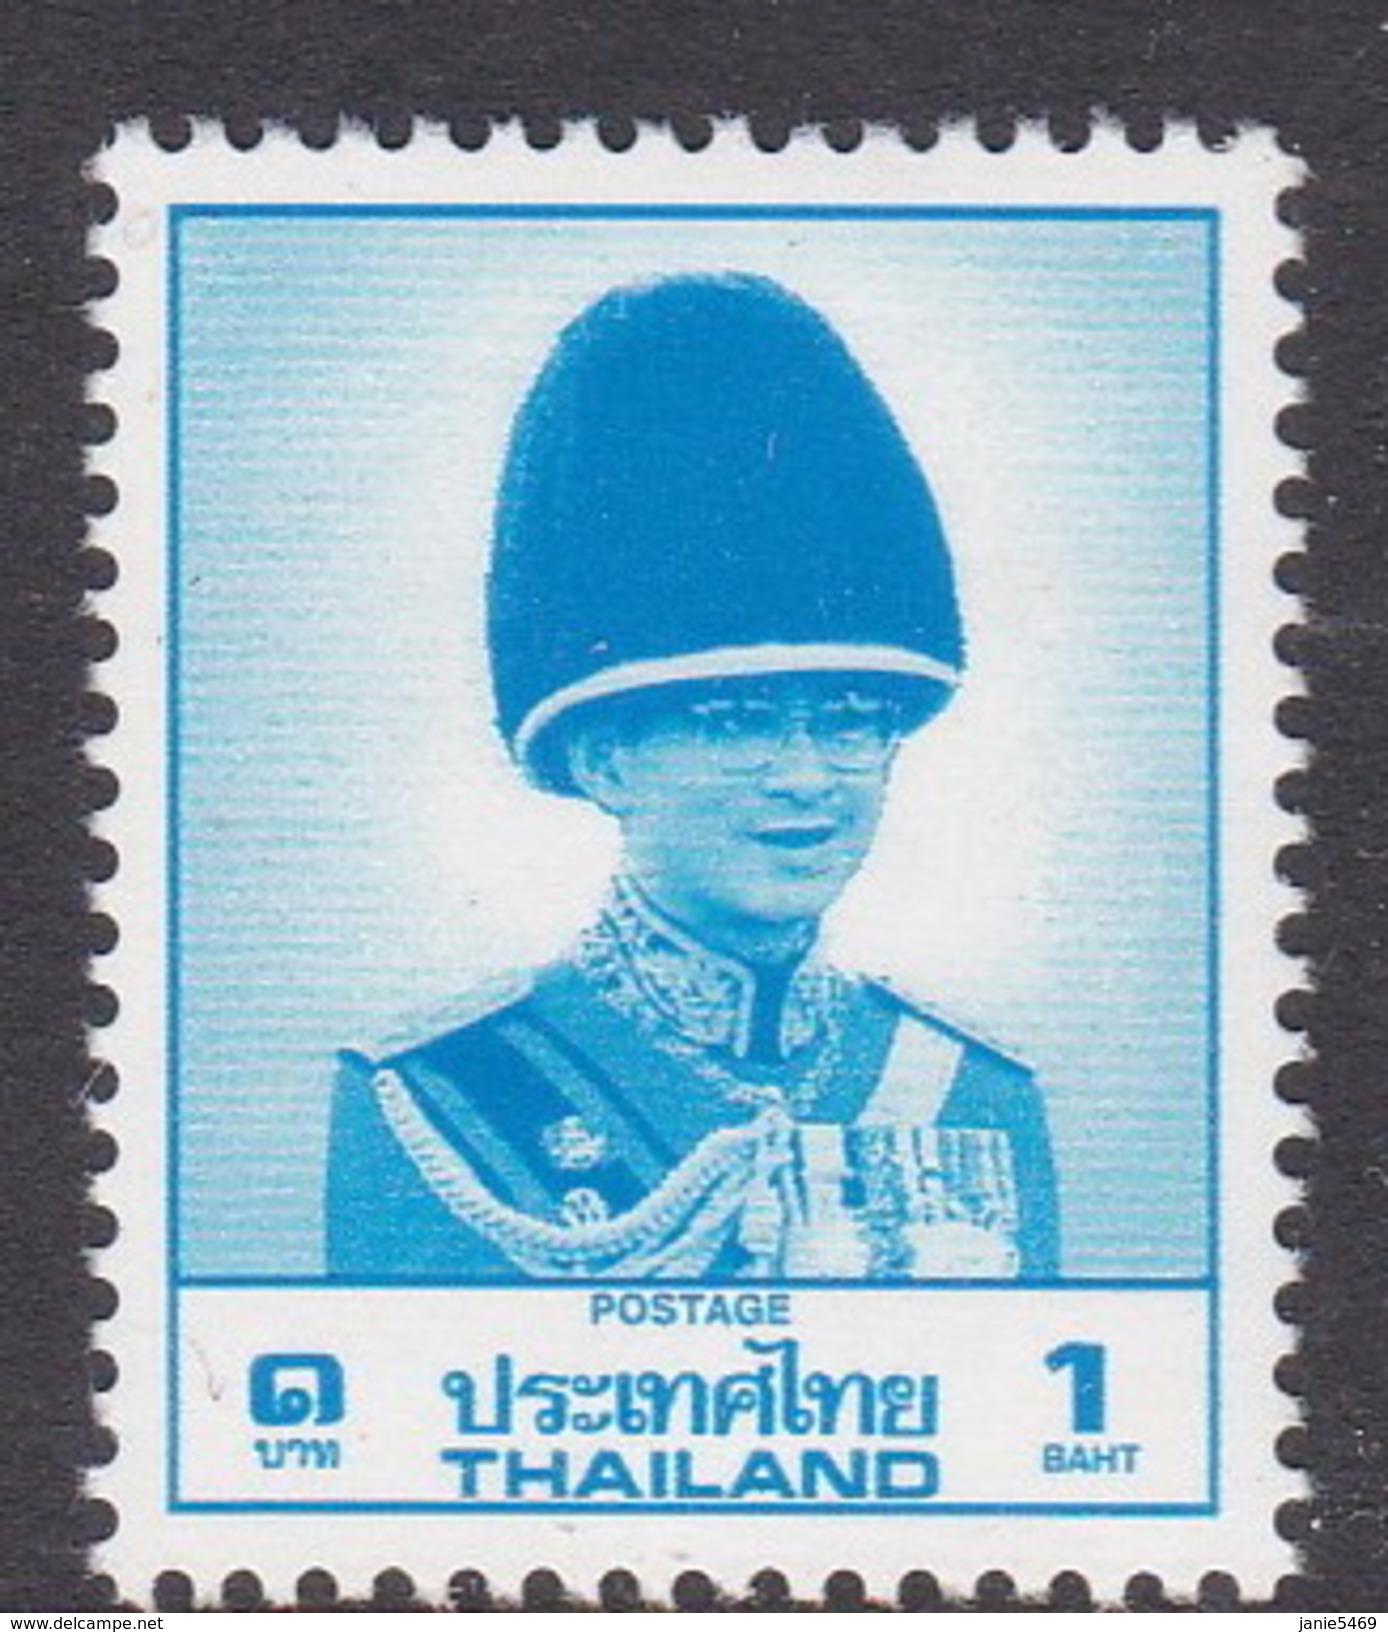 Thailand SG 1337 1988 King Rama IX  1 Baht MNH - Thailand